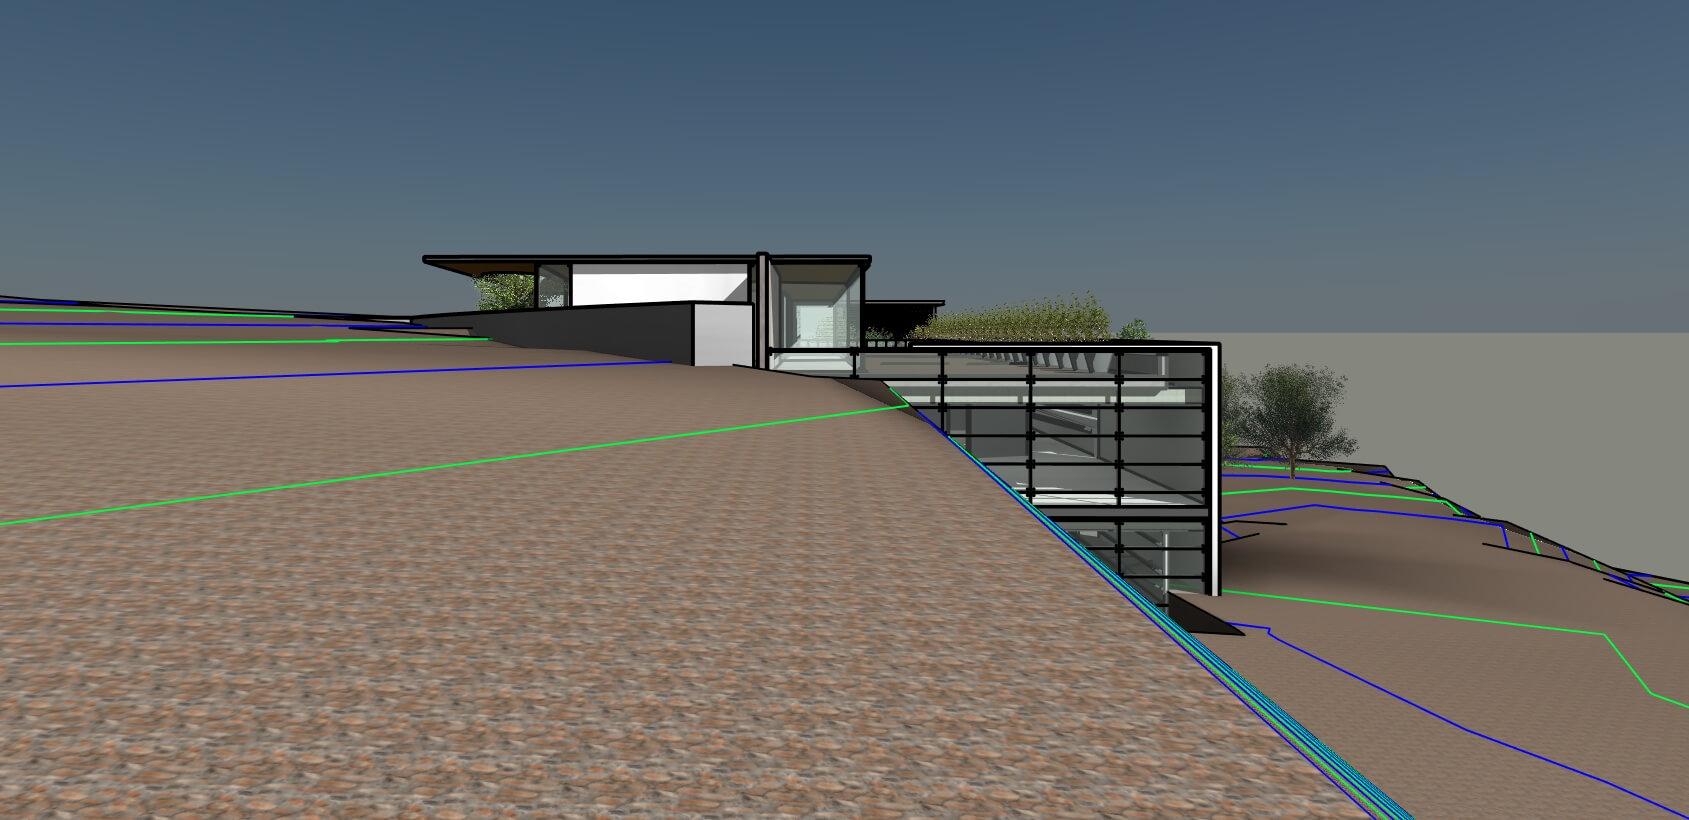 RZ-3D-new-3D-View-חזית-מערבית-פרספקטיבית